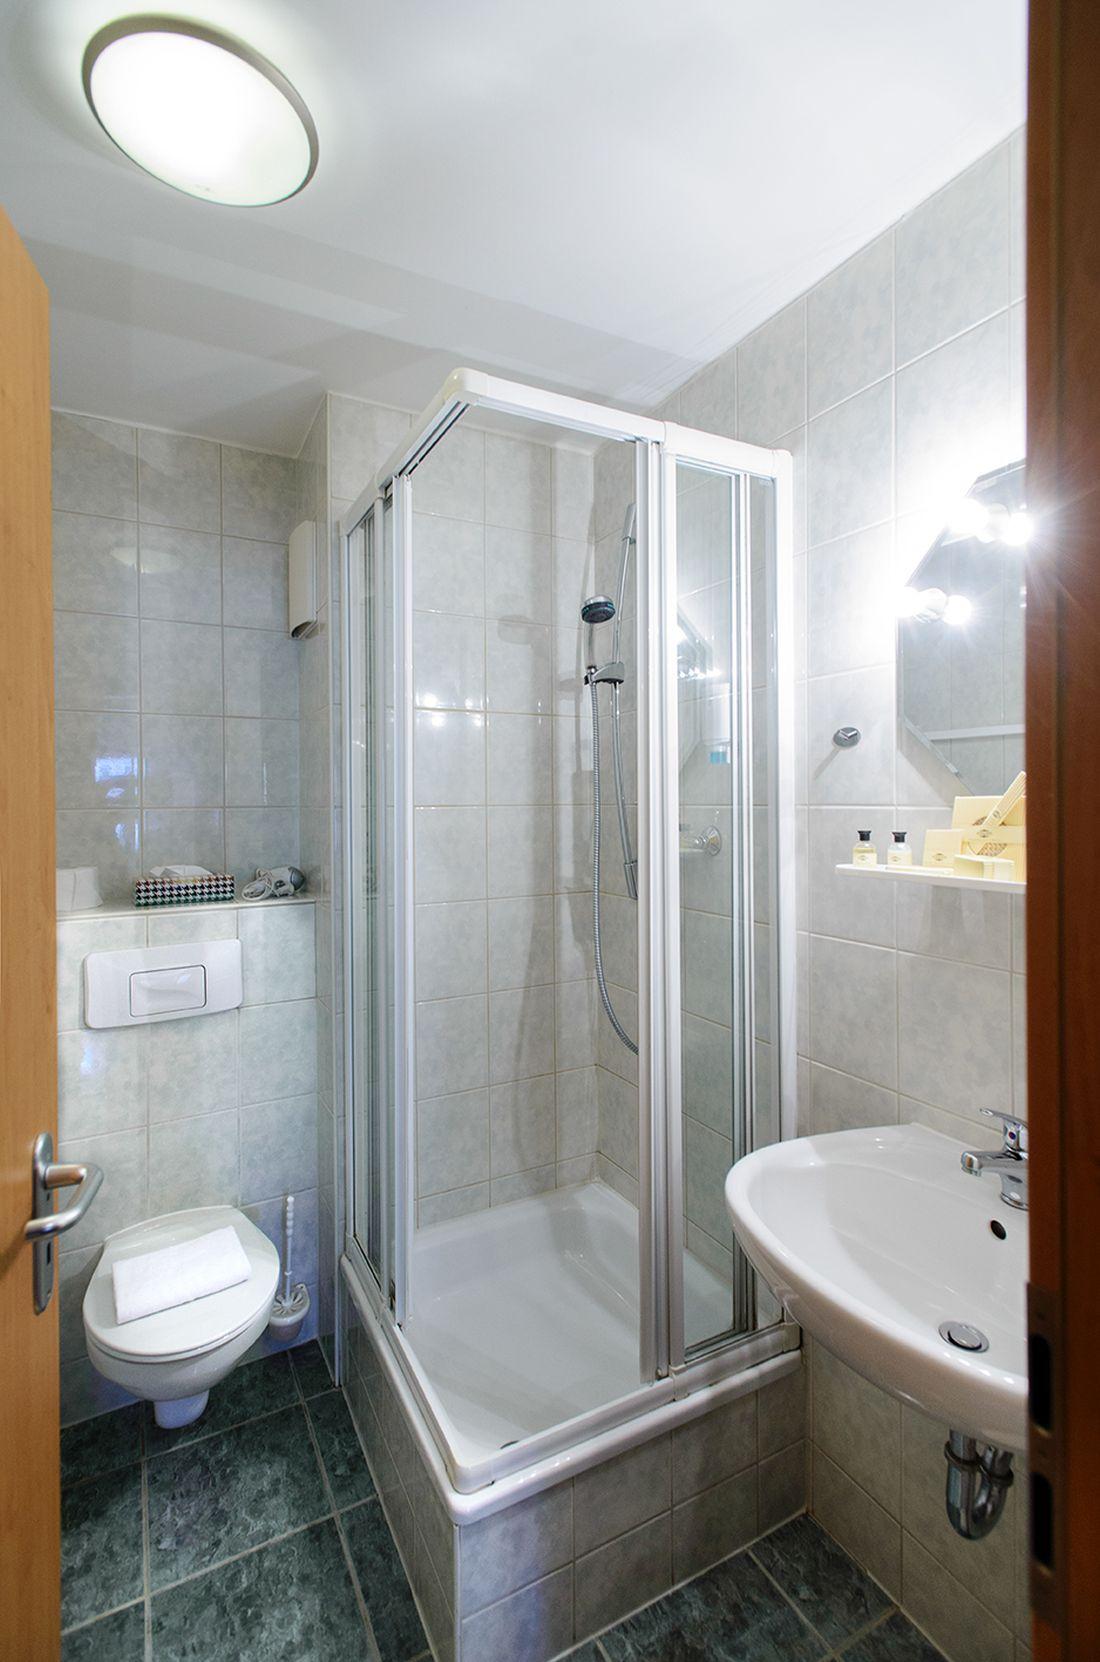 Doppelzimmer – Marktblick - bautzen-pension-zimmer-005-1.jpg